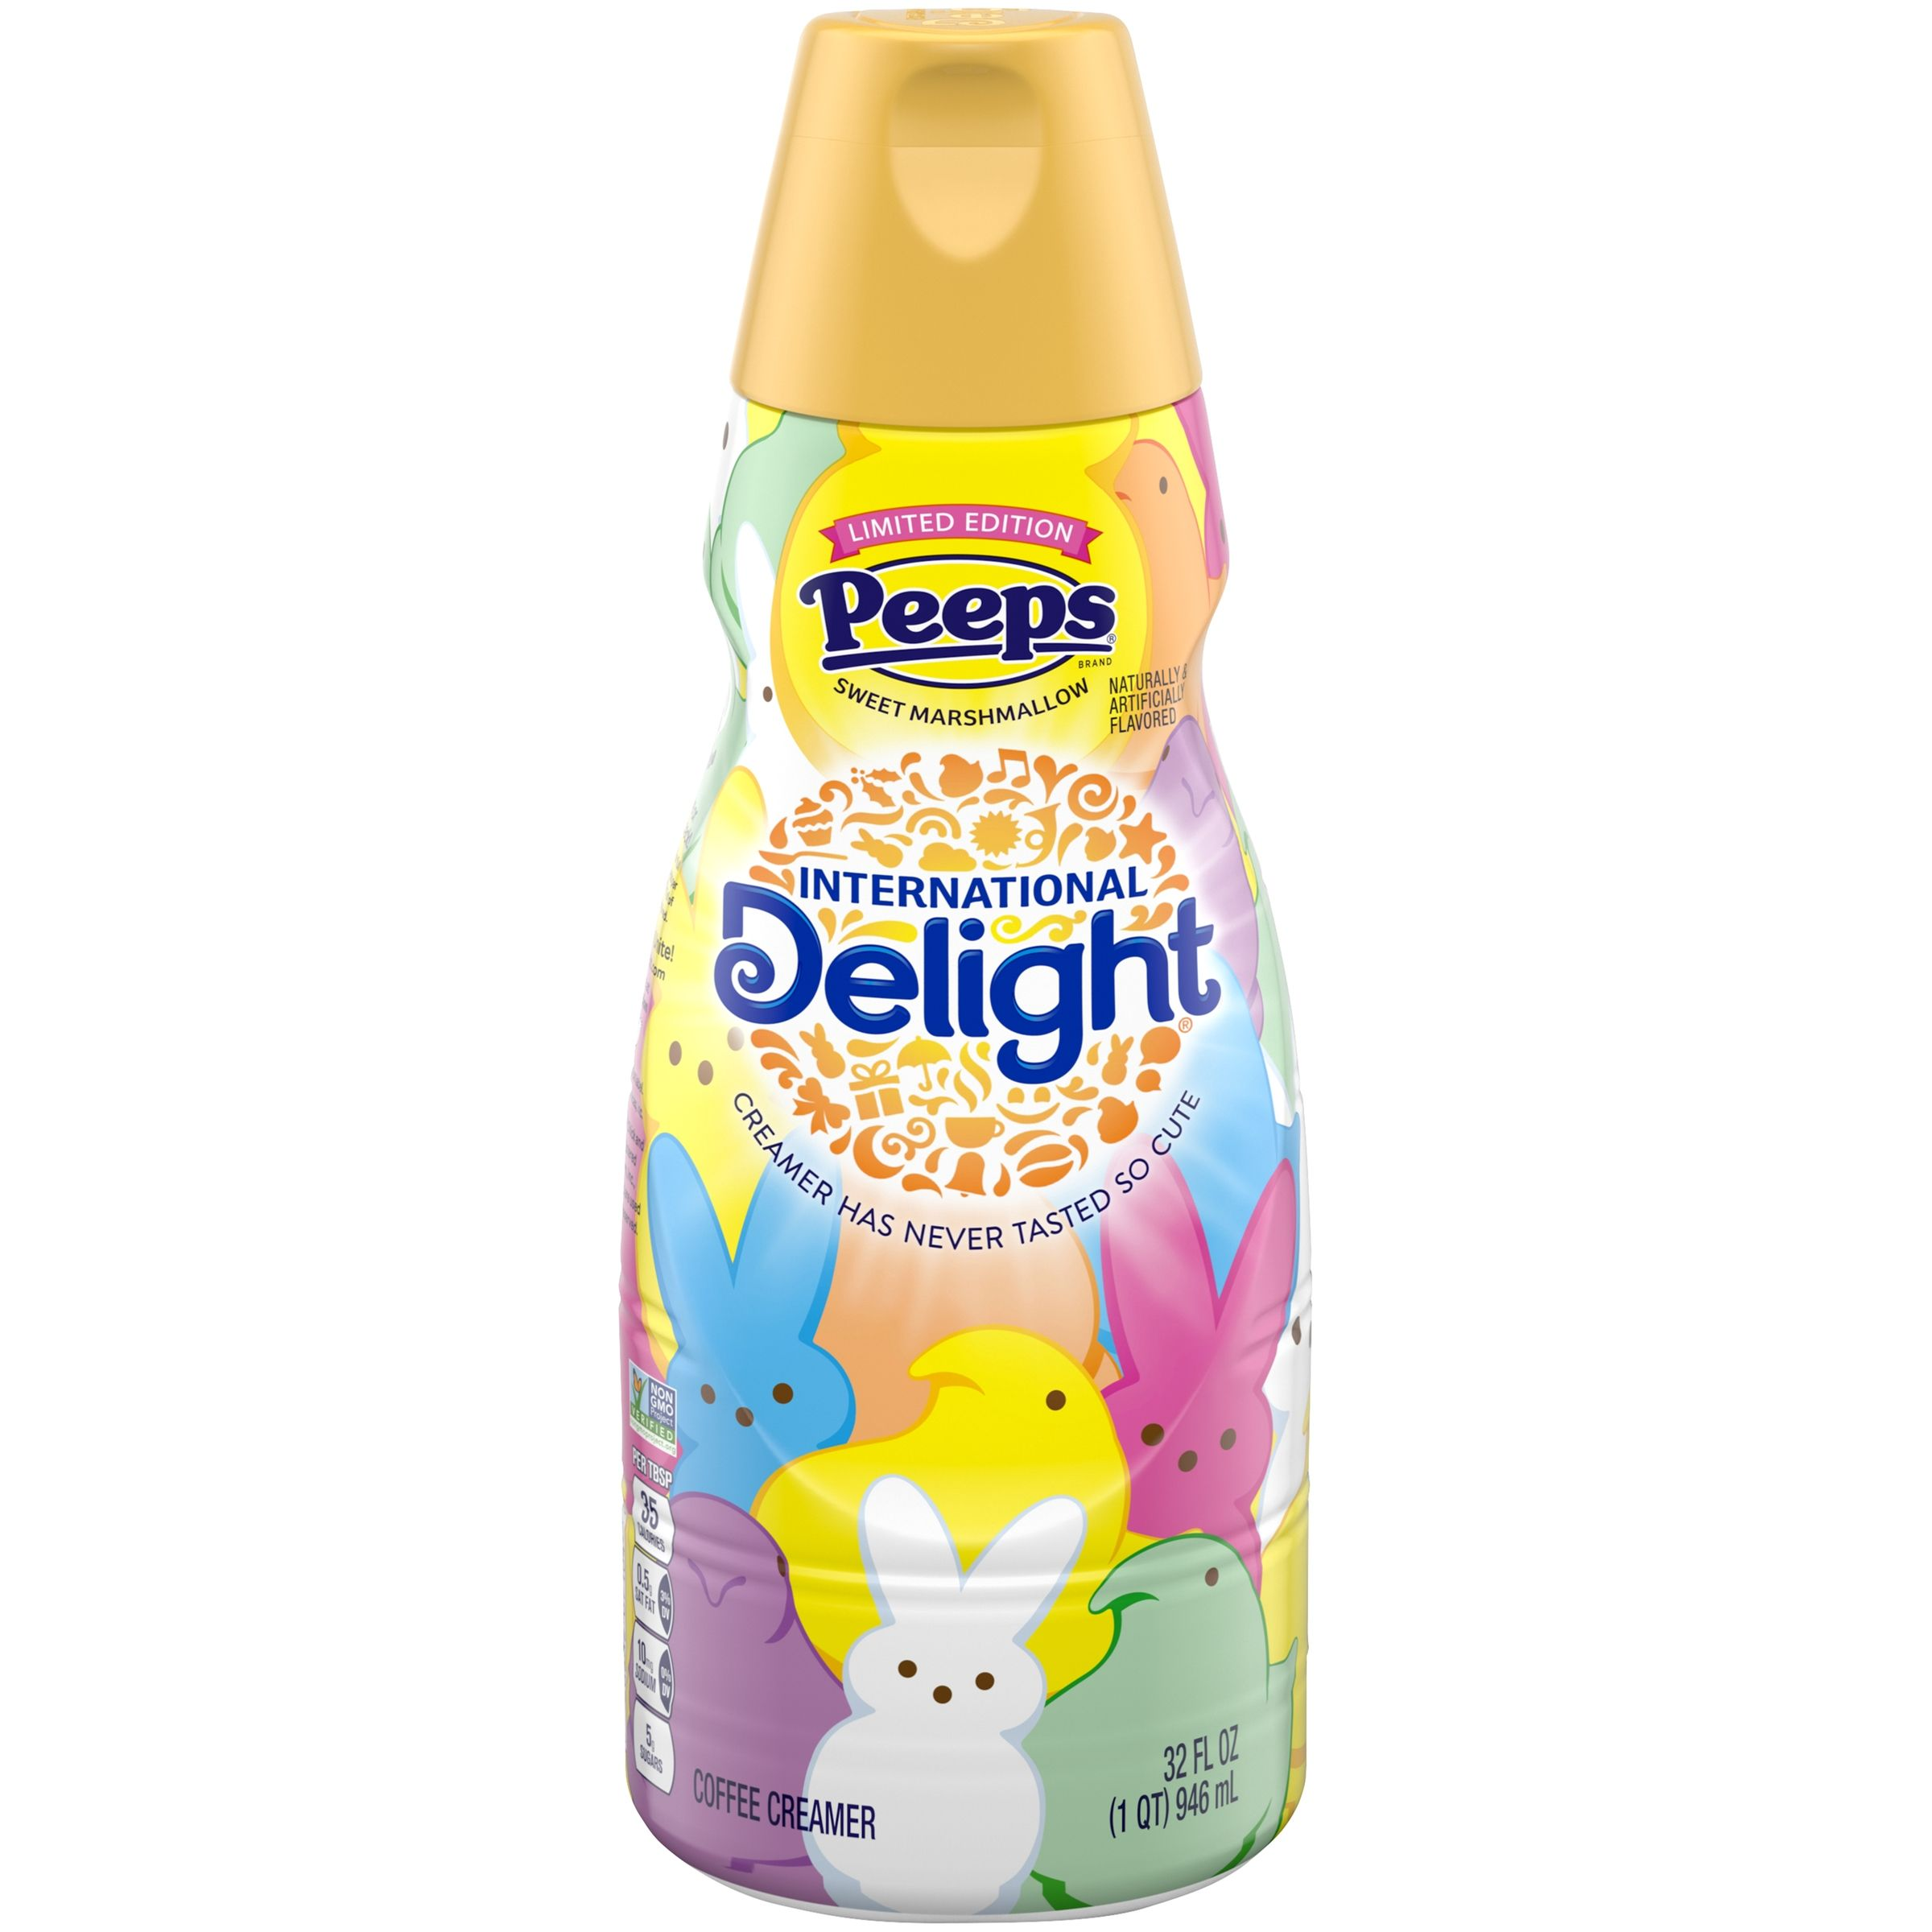 International delight peeps coffee creamer 32 fl oz